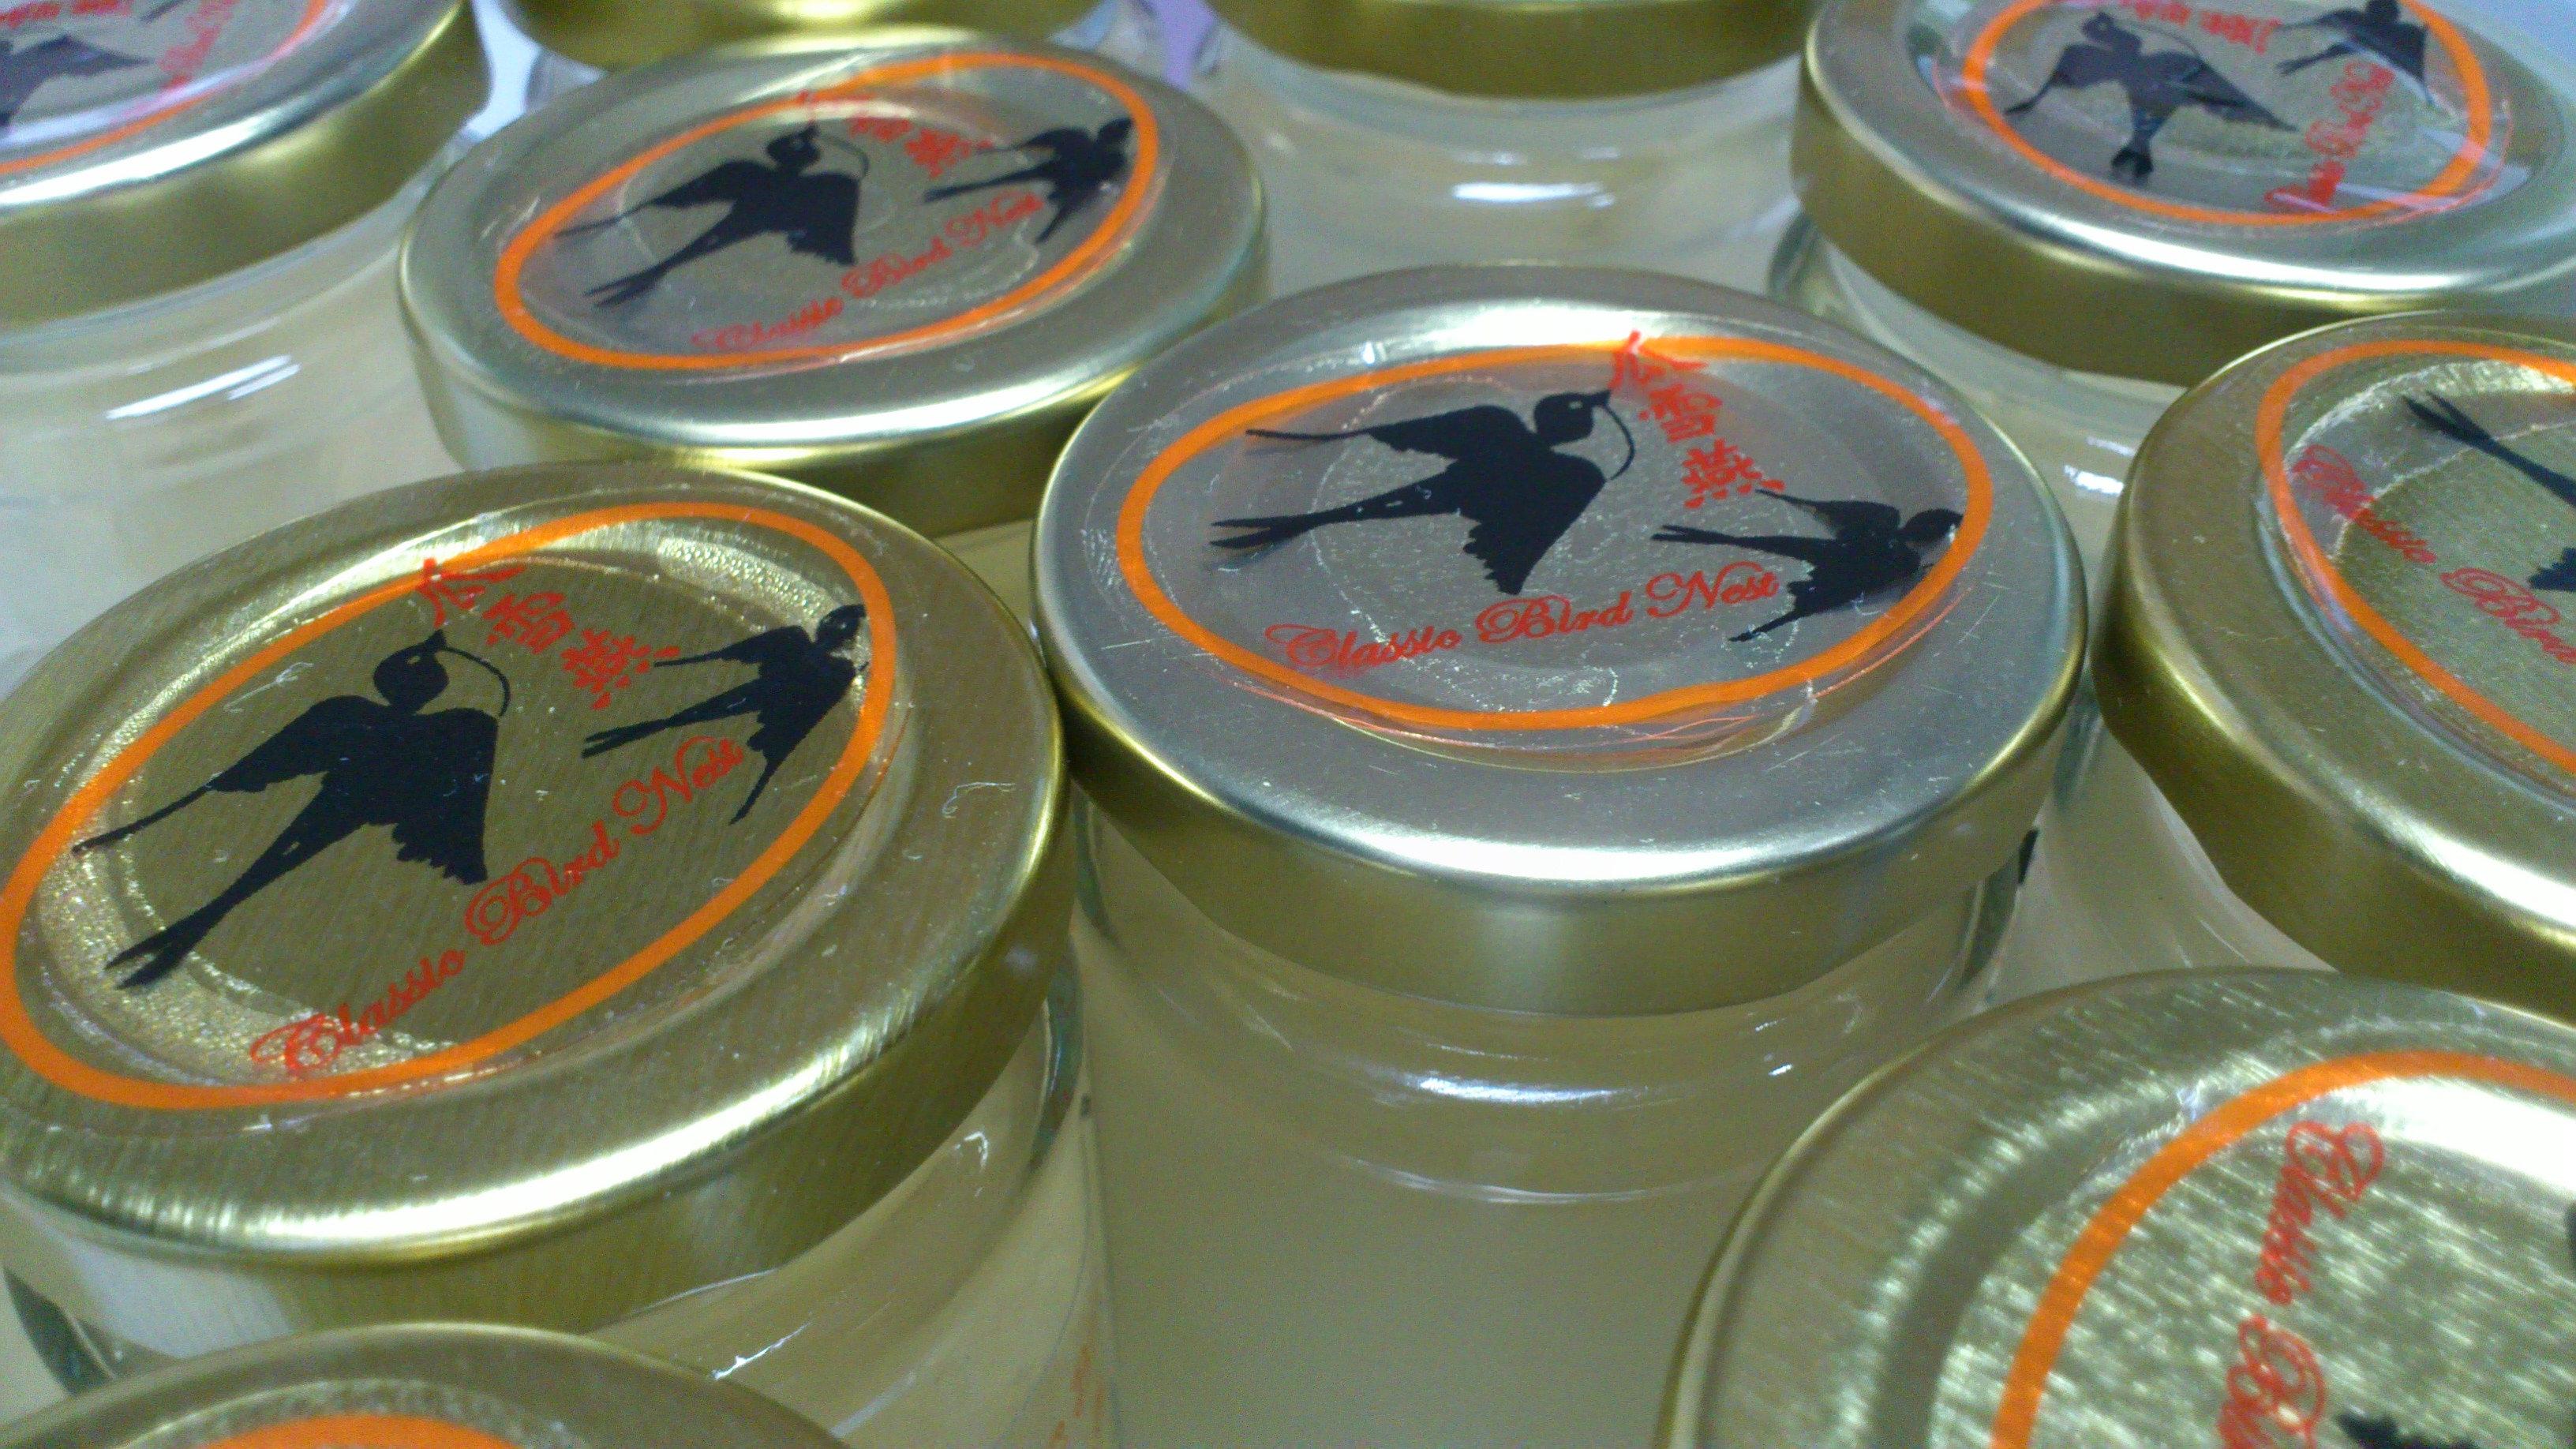 bird nest malaysia | 保健饮品-泡参燕窝。。。: classicbirdnest.wix.com/classicbirdnest#!保健饮品-泡参燕窝...